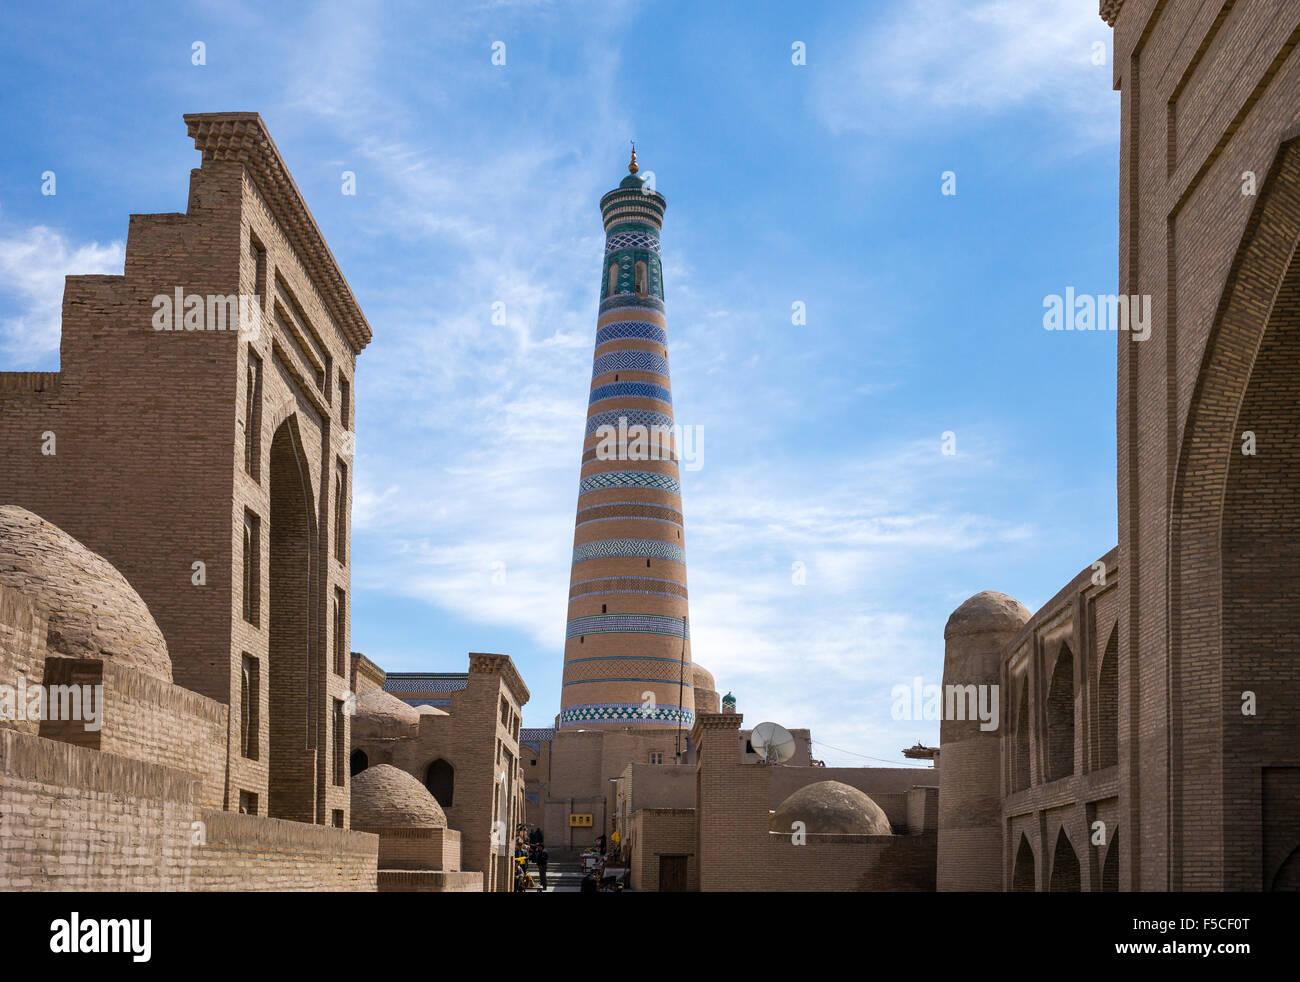 Uzbekistan, Khiva, the Islam Kodija minaret in the old city center - Stock Image